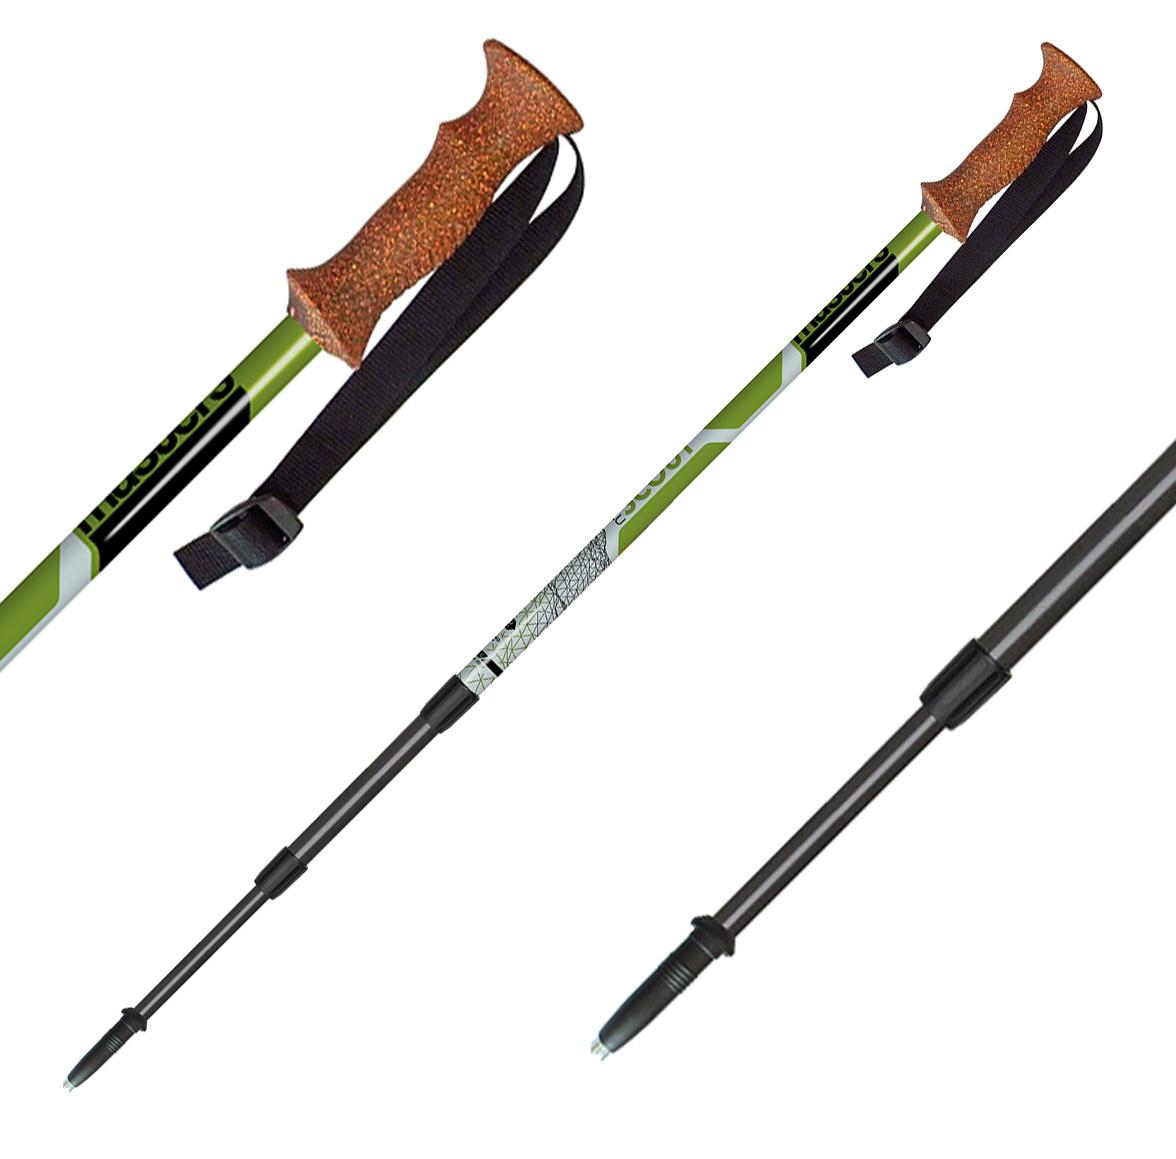 Телескопические палки, SCOUT GREEN, RECREATIONAL BACKPAKING СЕРИЯ 01S1616, Треккинговые палки - арт. 510190287